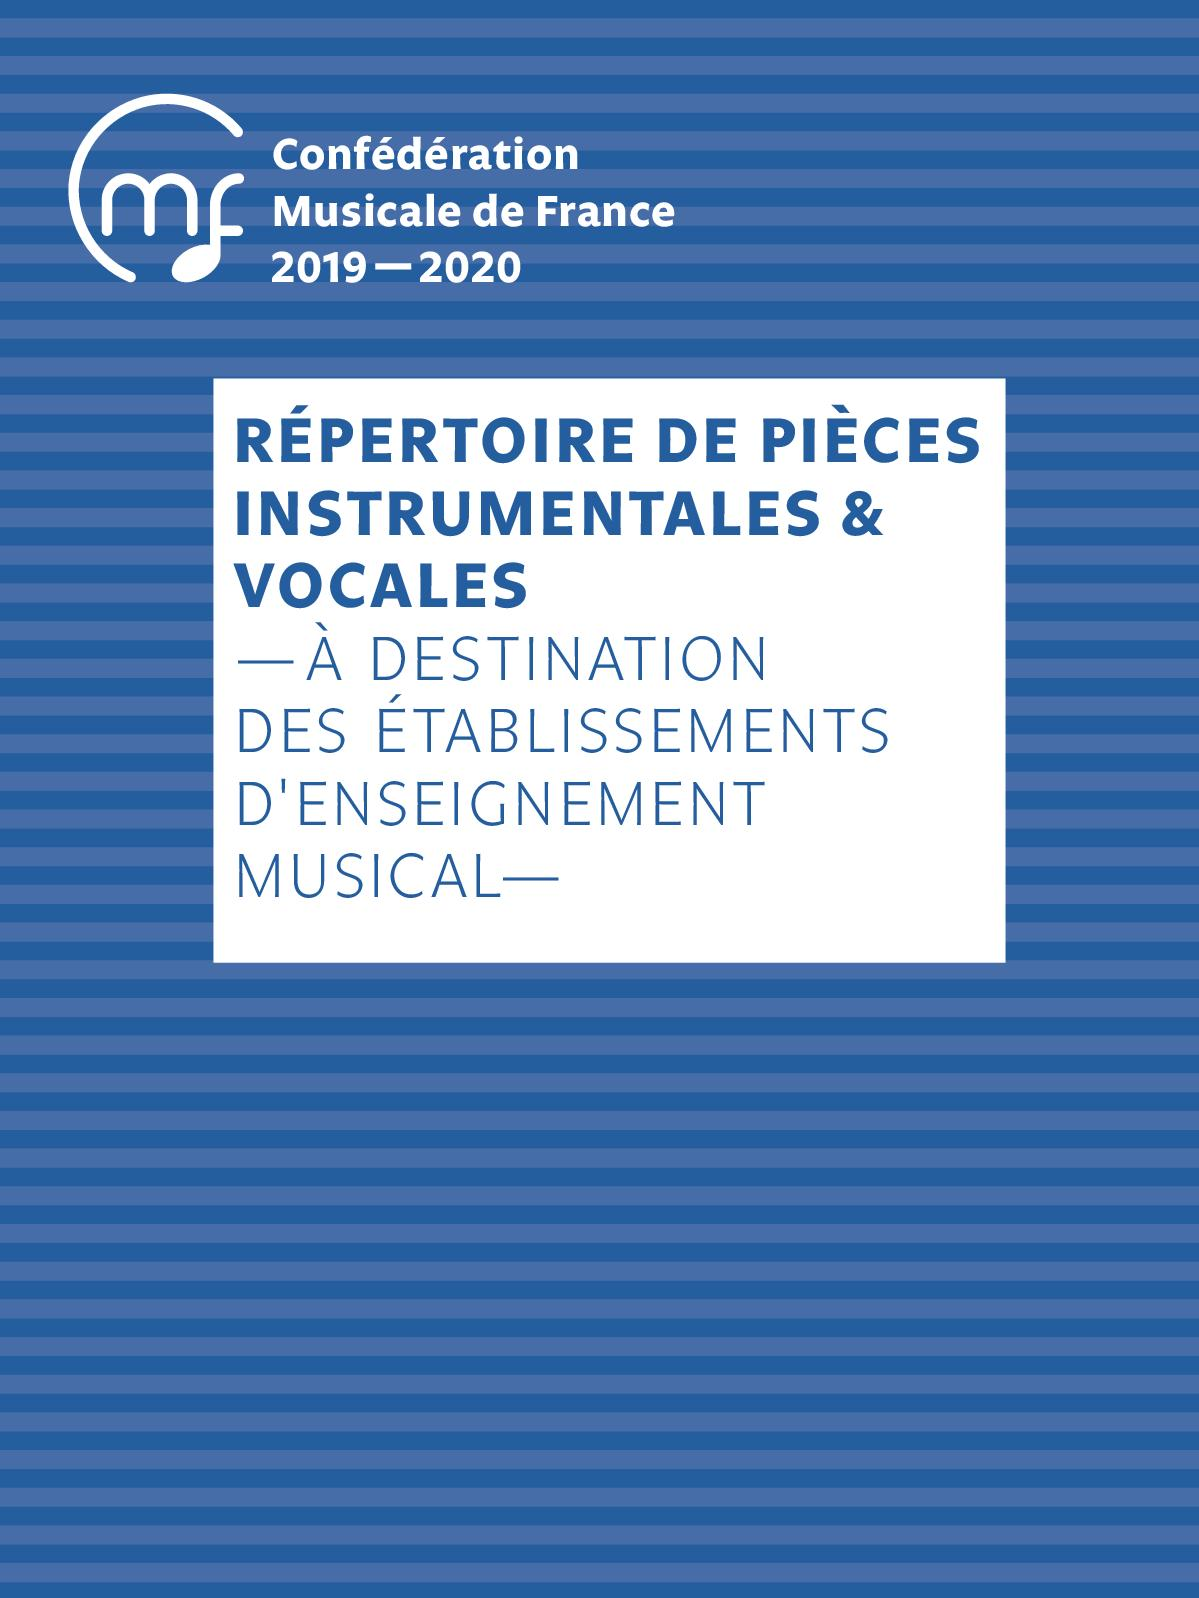 Calameo 2020 2021 Repertoire Instrumental Enseignants Artistiques